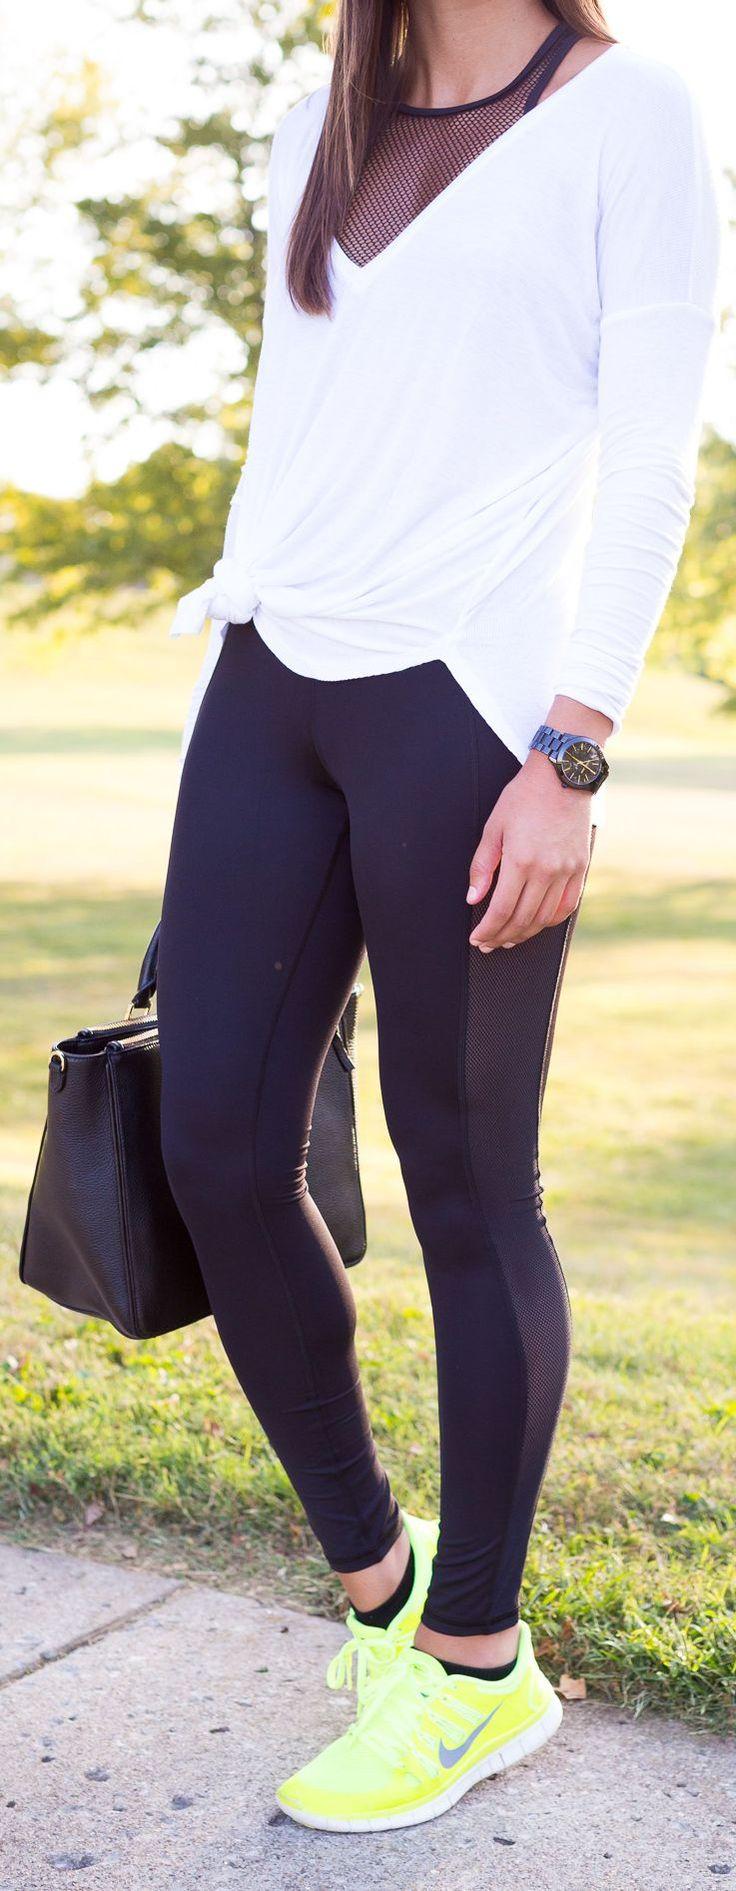 A Southern Drawl: black mesh tank + white longsleeve tee + black workout pants with mesh panel + neon yellow sneakers